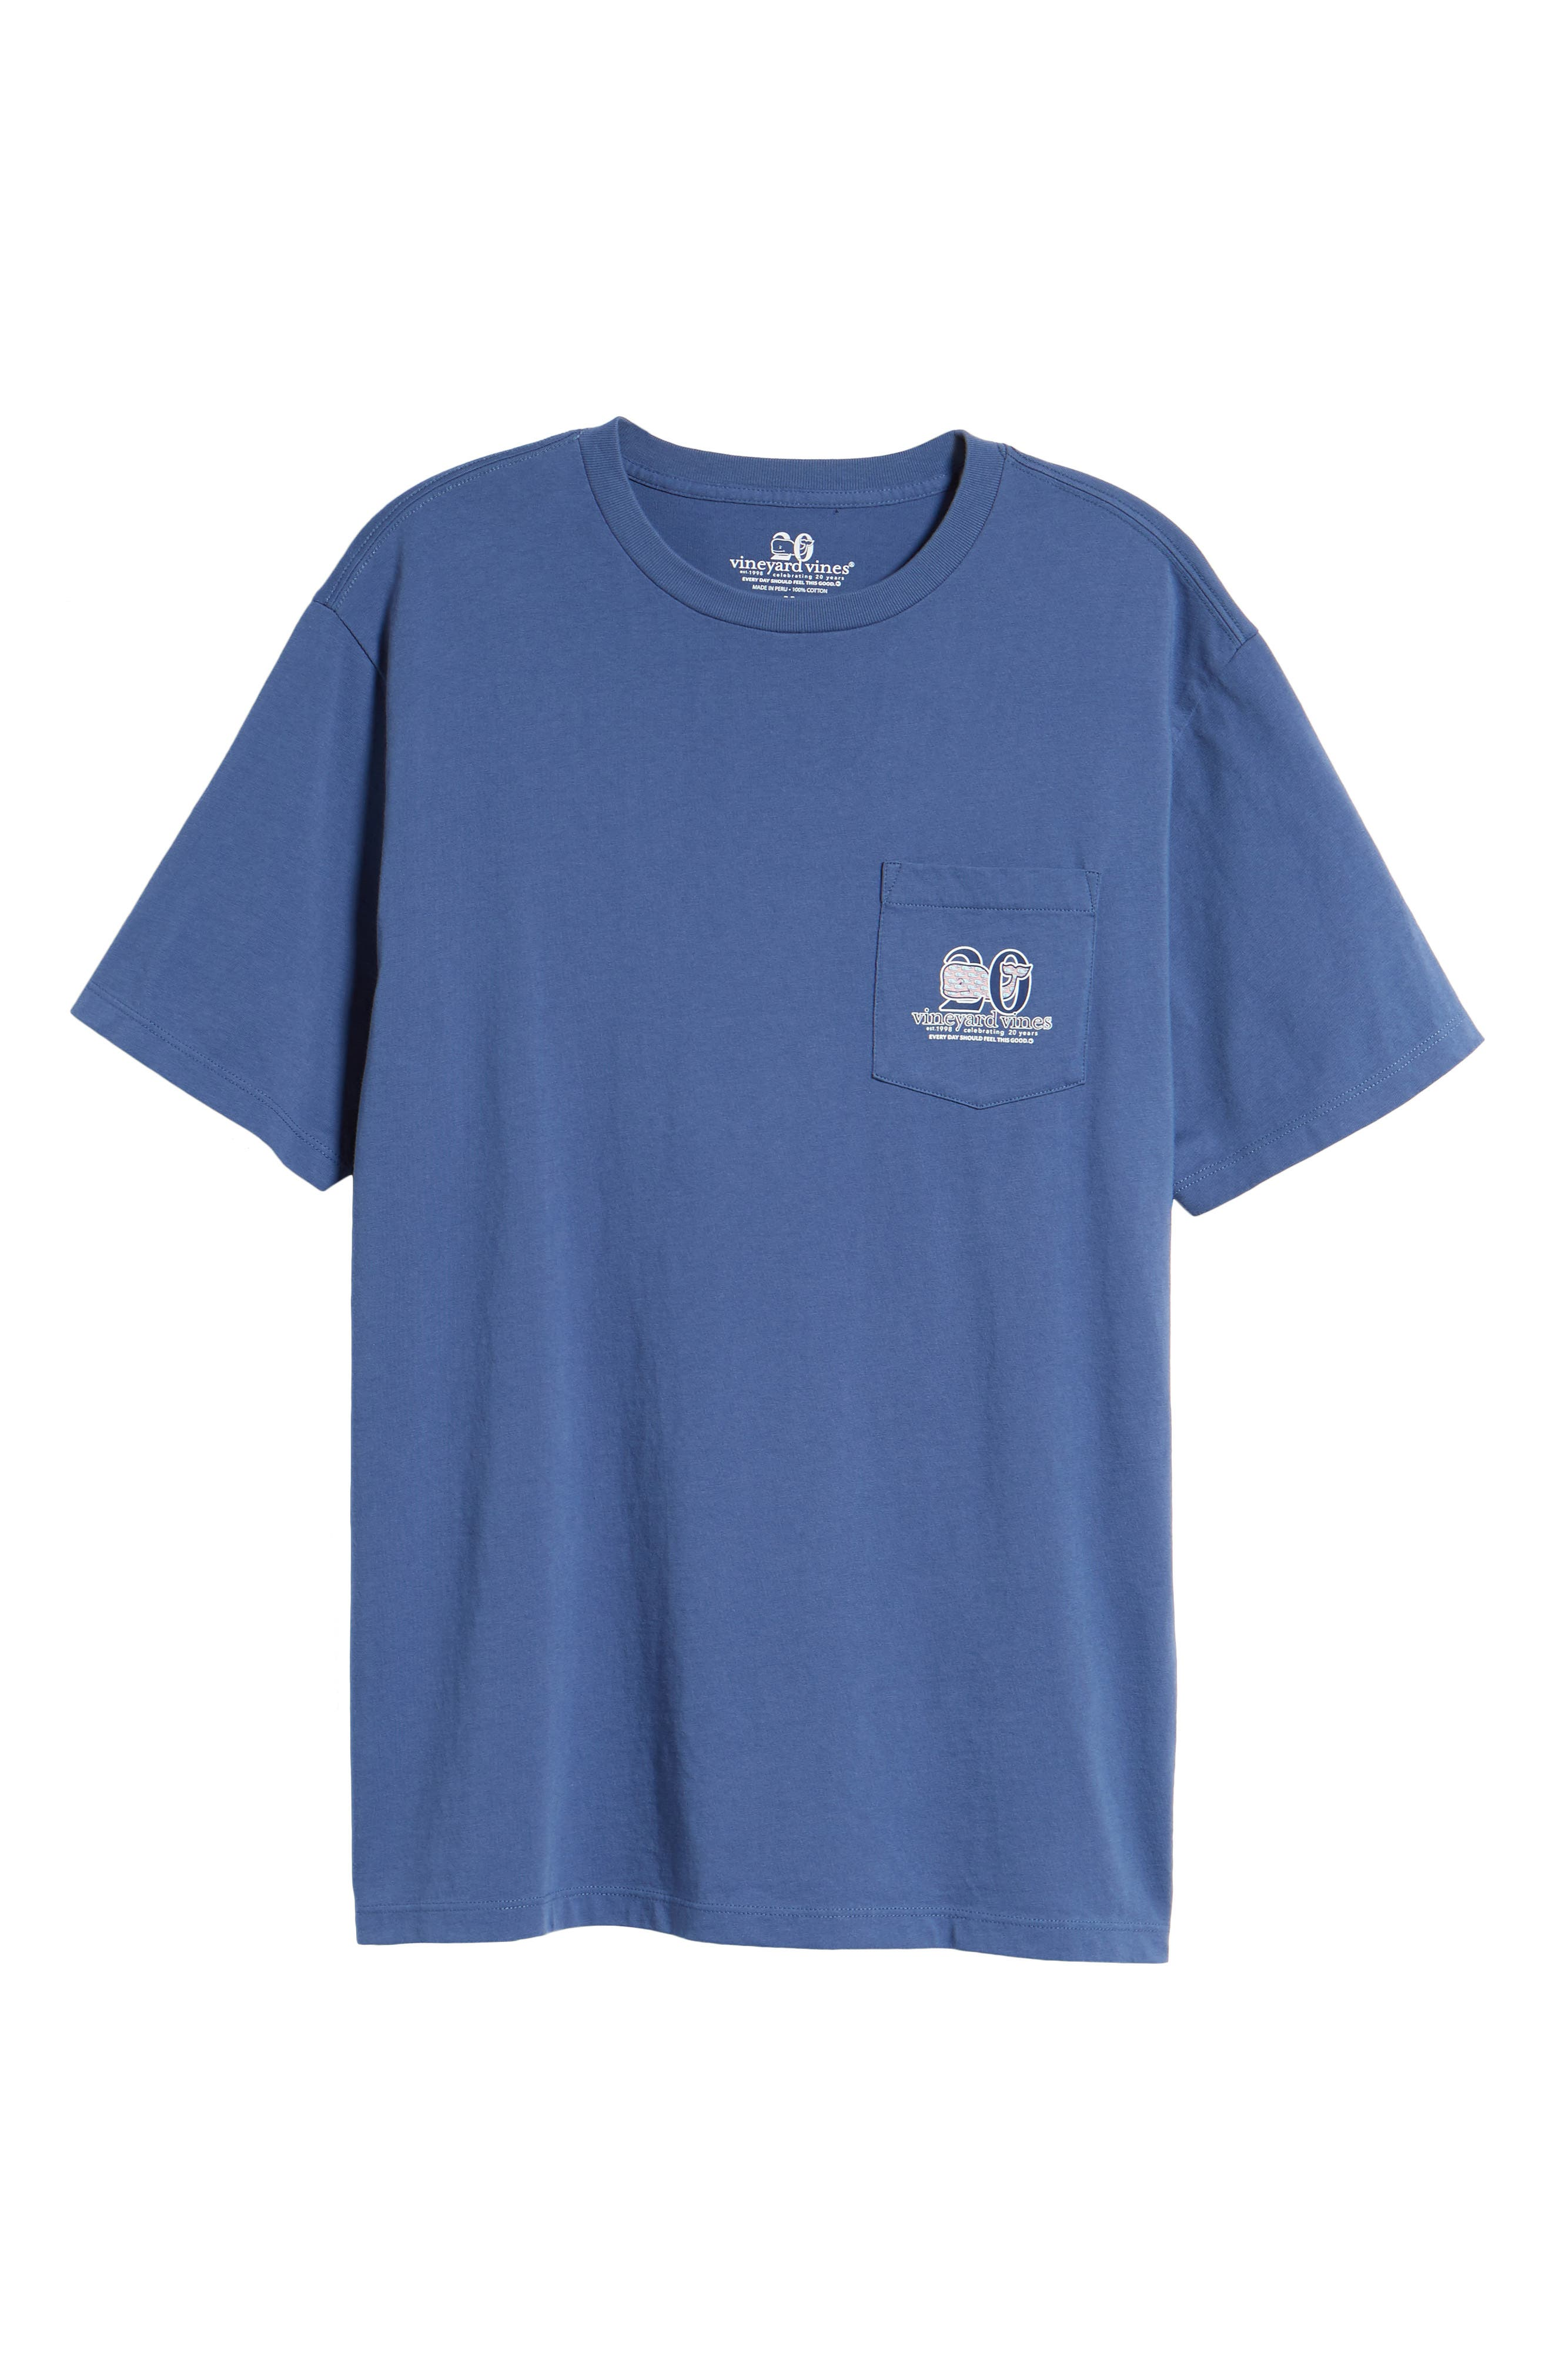 Patchwork Whale Pocket T-Shirt,                             Alternate thumbnail 6, color,                             Moonshine